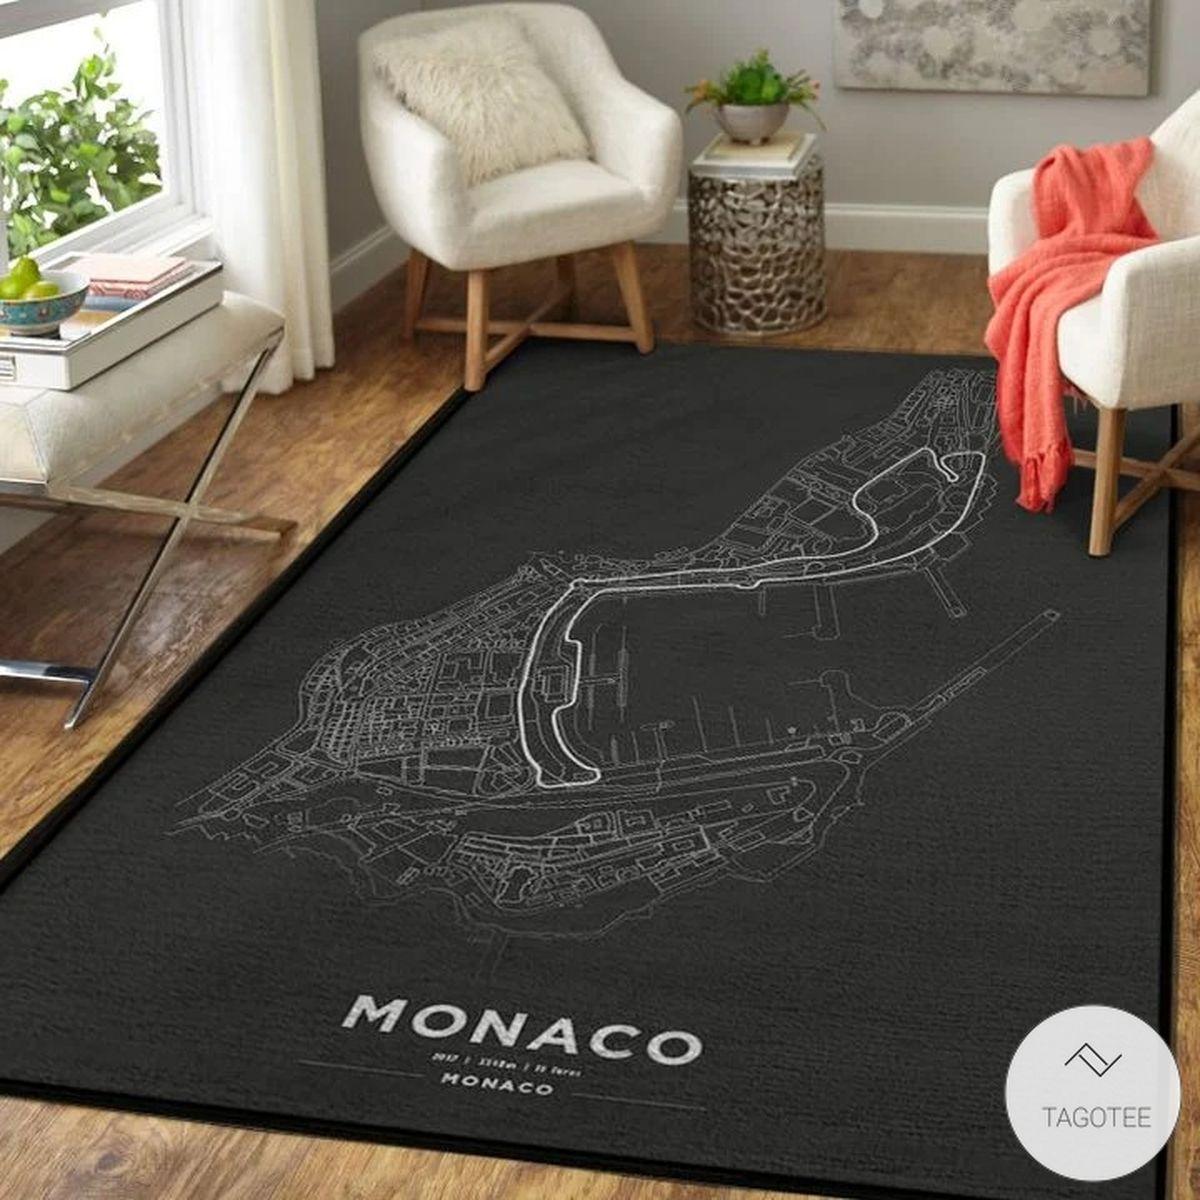 Monaco F1 Circuit Map Rug